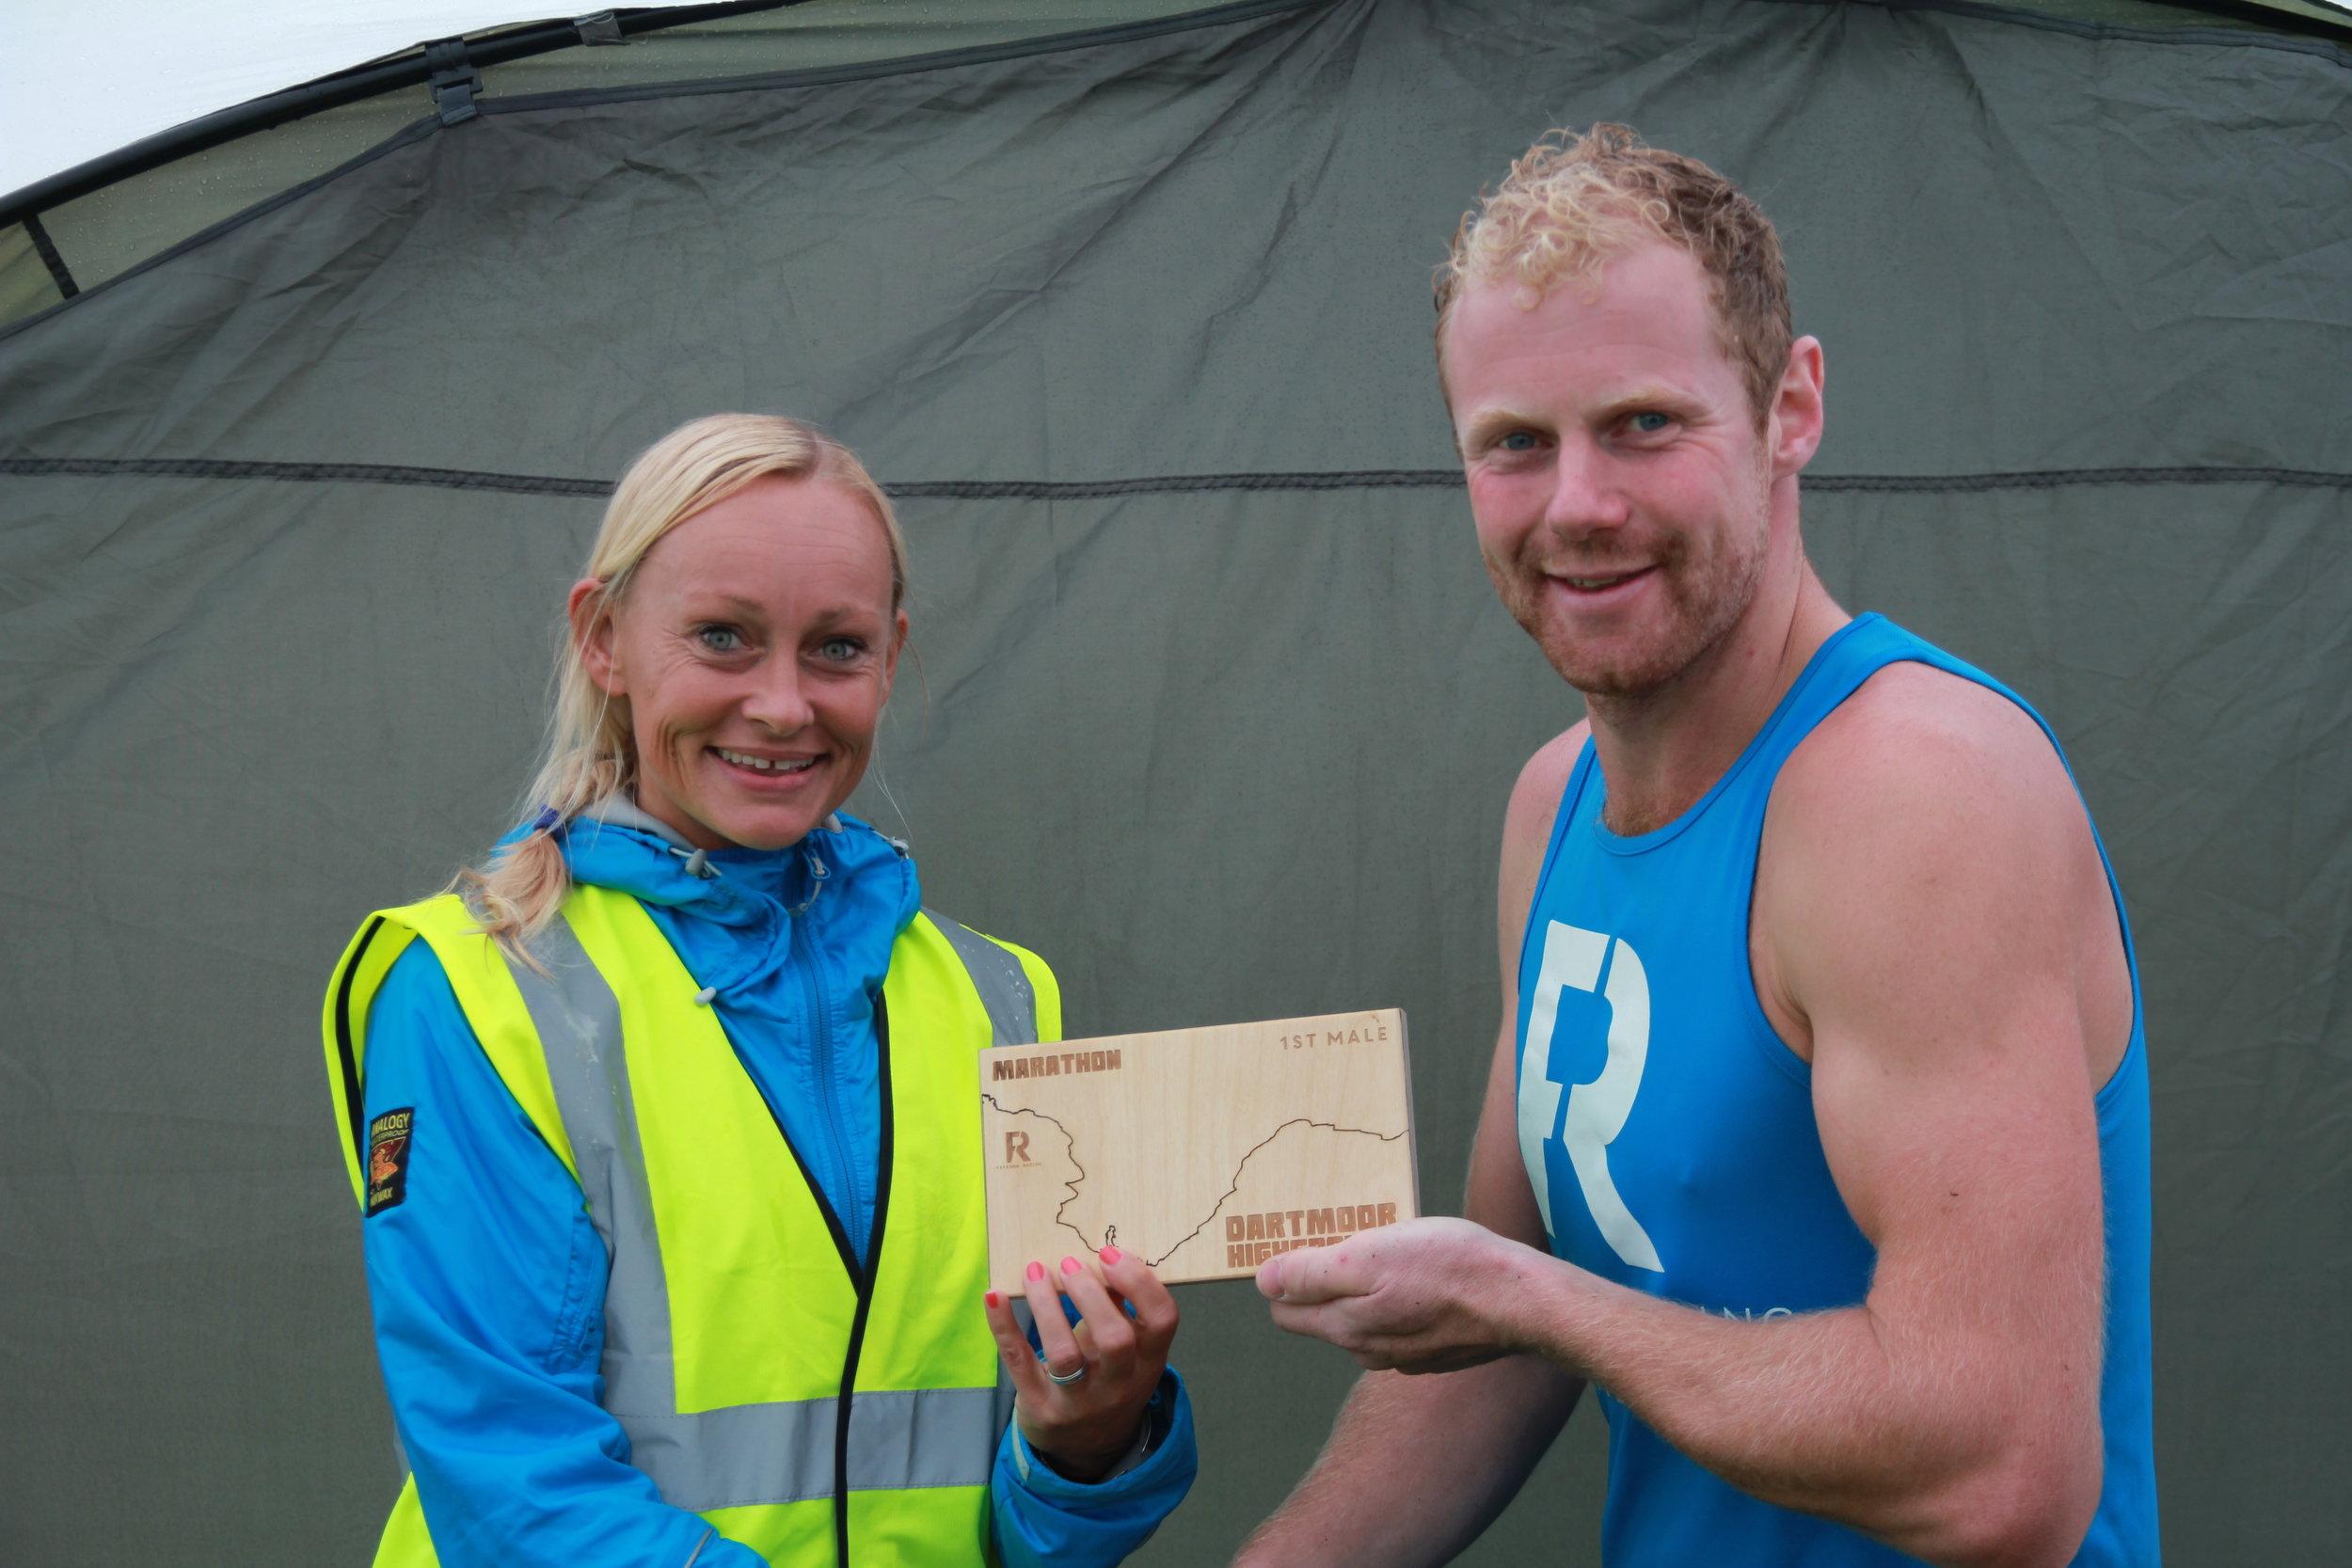 Freedom Racing Athlete winning the Dartmoor Marathon